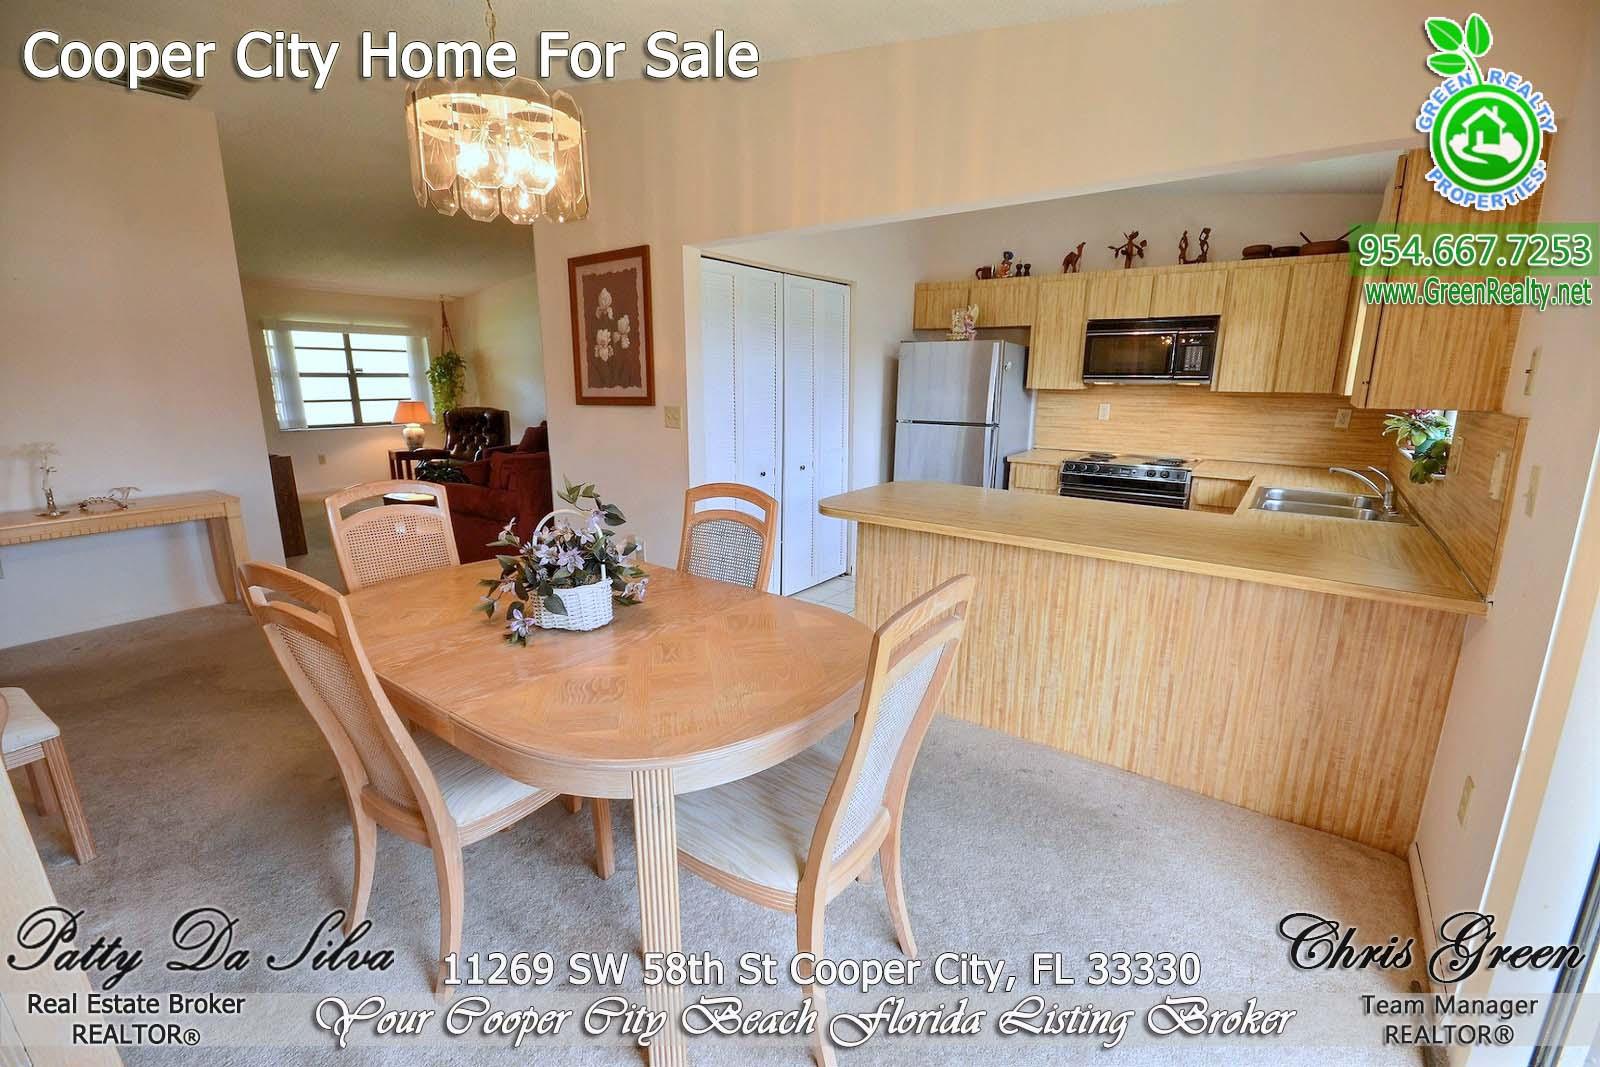 9 Cooper City Real Estate - Villas (14)